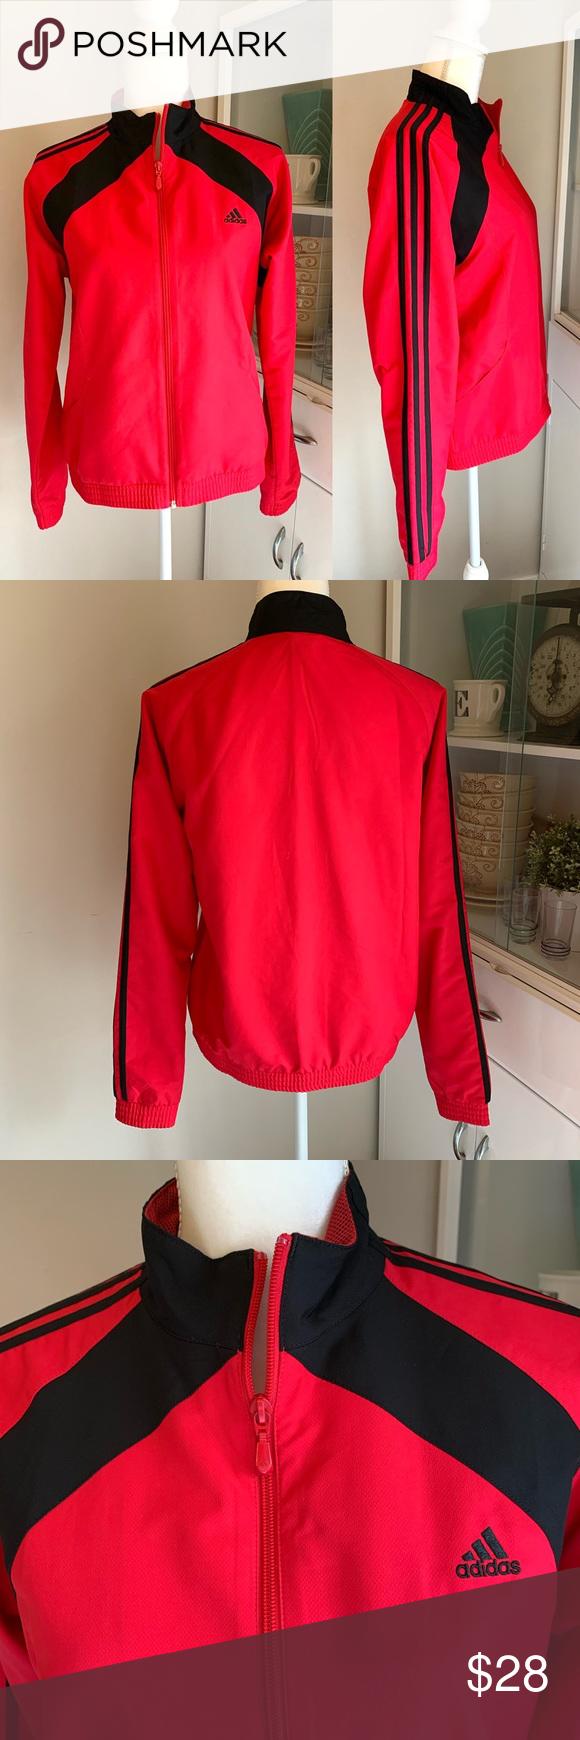 Roux Mezclado dentista  Adidas black/red zip up track jacket in 2020   Black adidas, Red adidas,  Track jackets